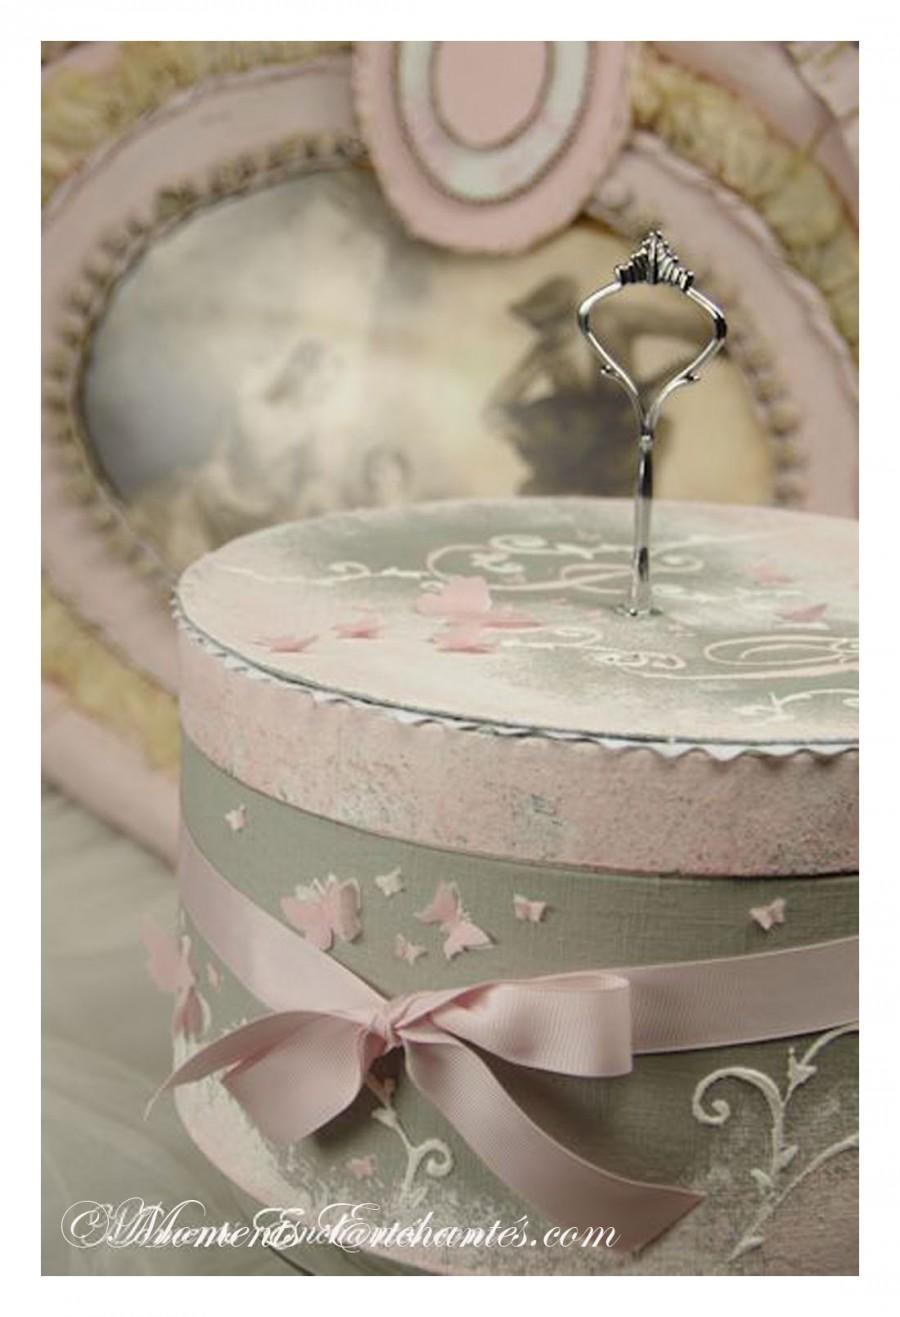 زفاف - Urne mariage